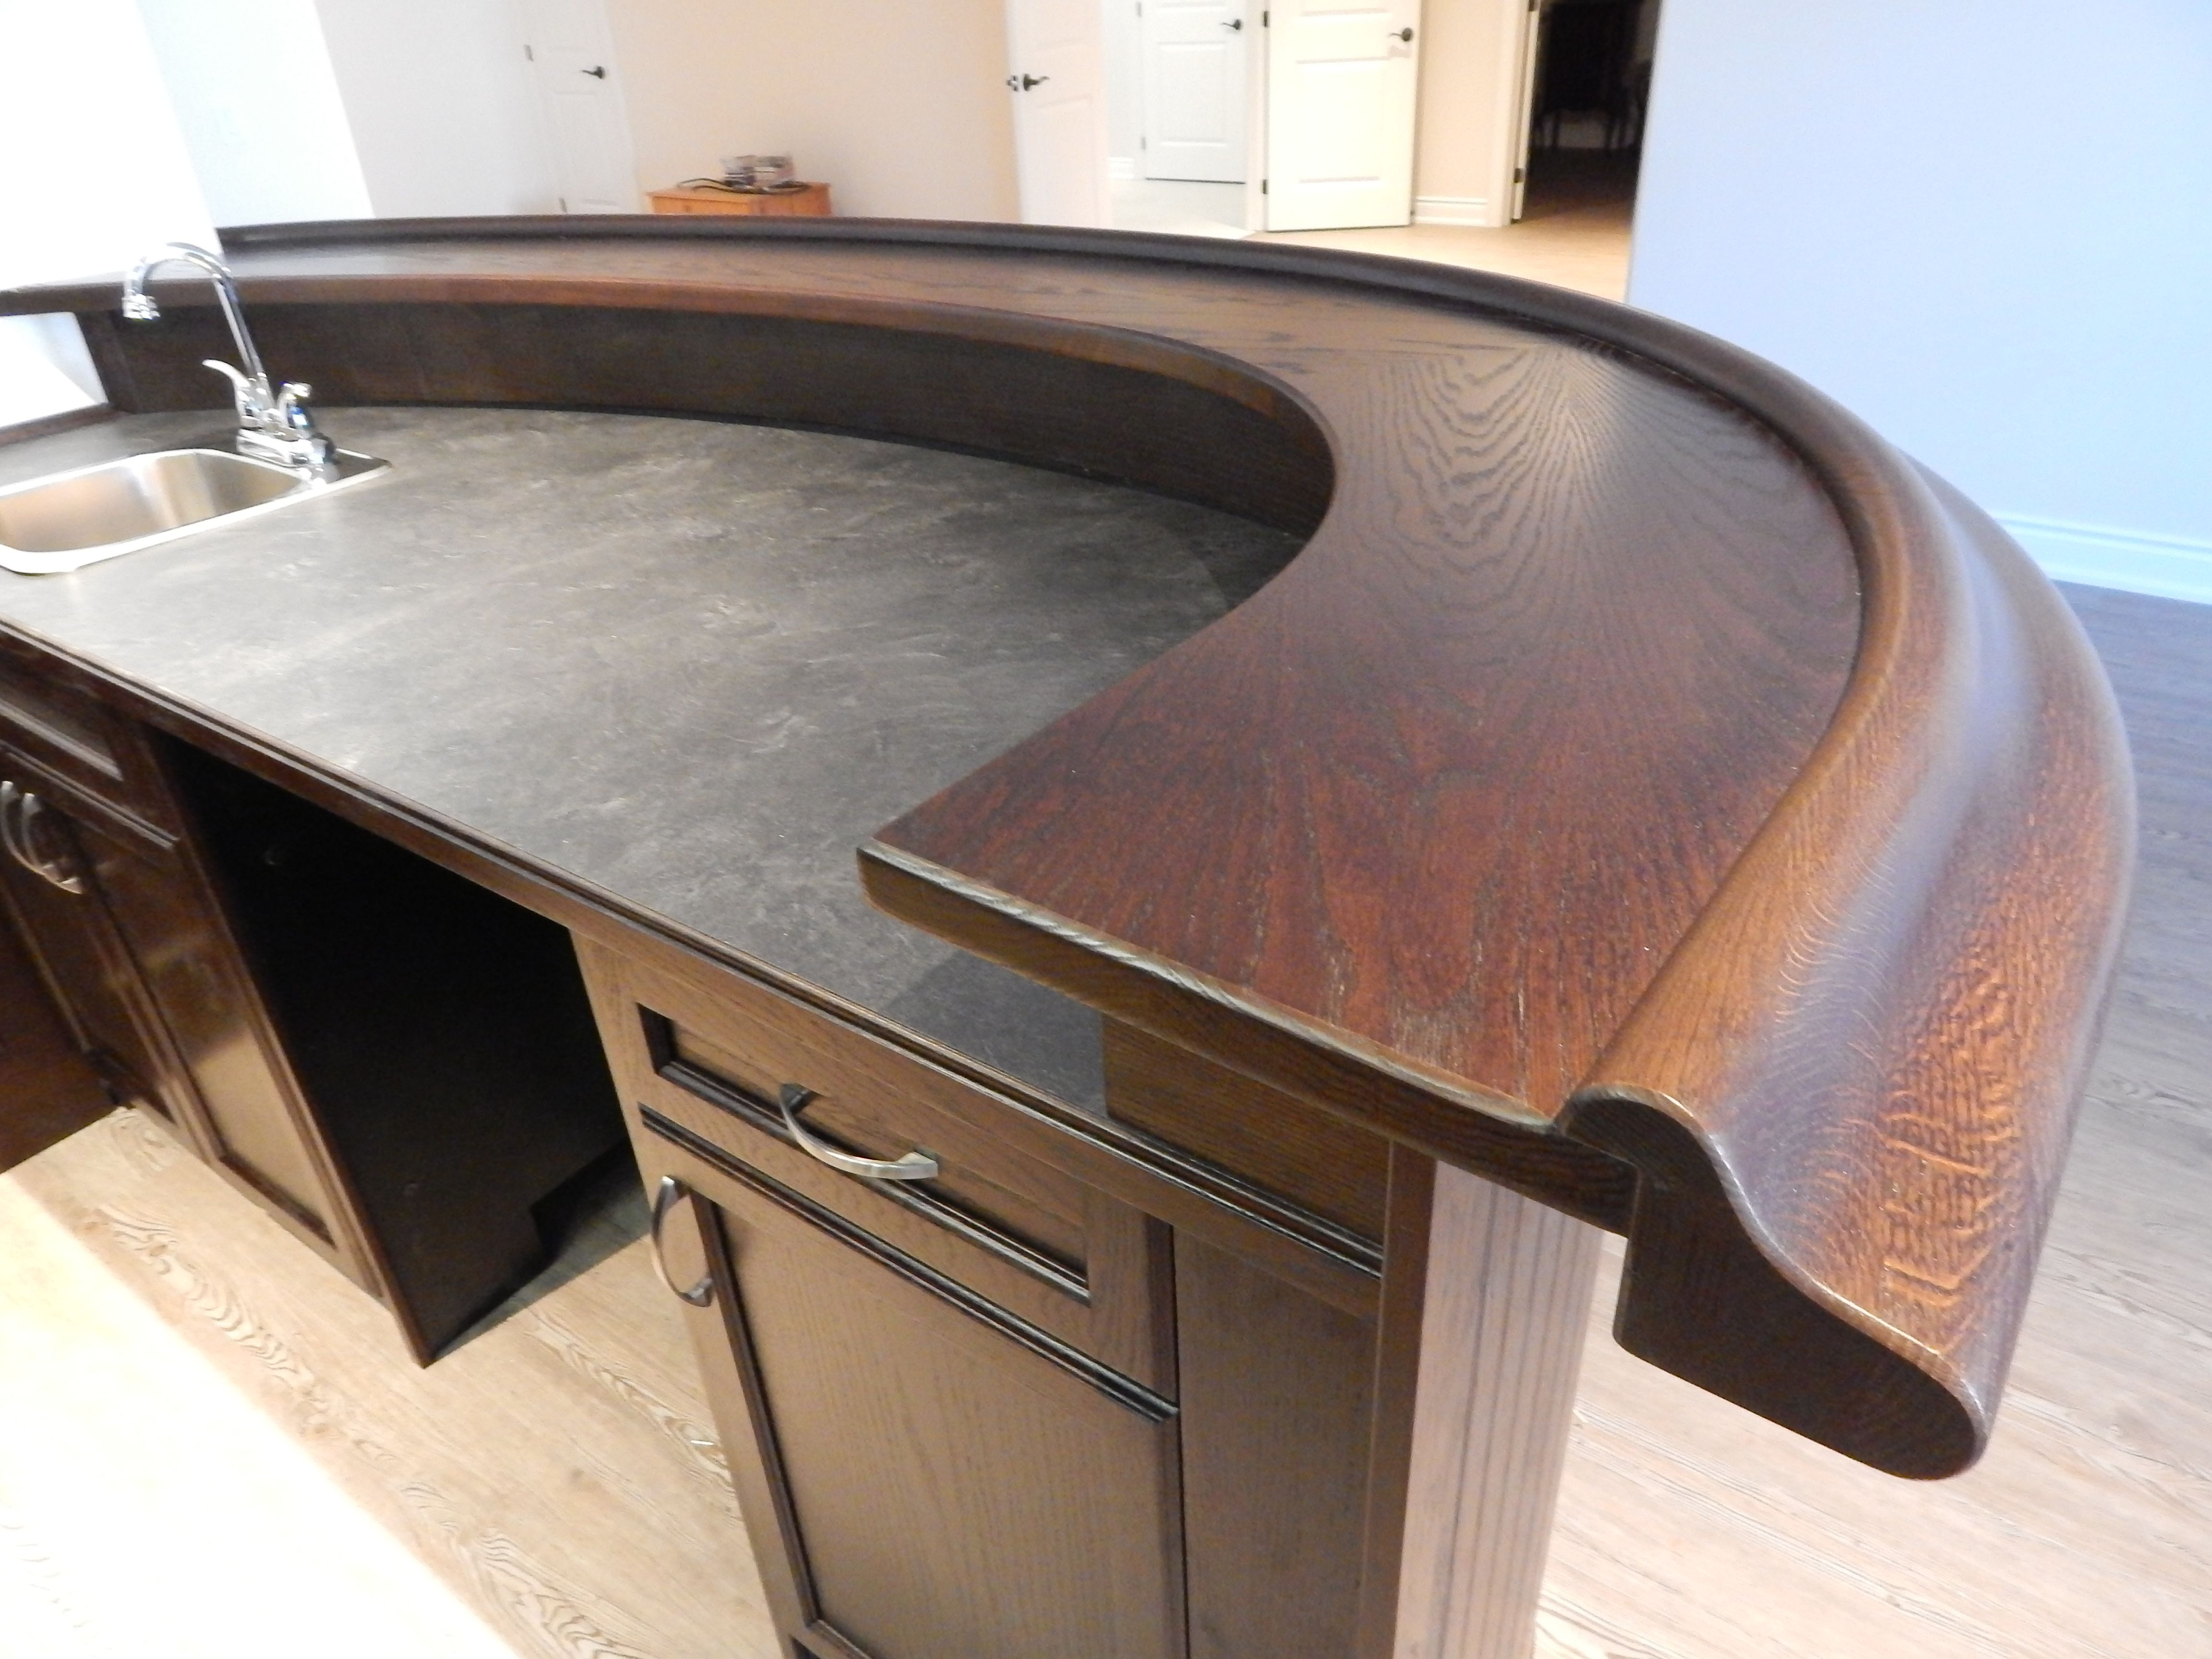 Attirant Solid Oak Bar Top And Bar Rail With Laminate Counter Top, Sink U0026 Faucet.